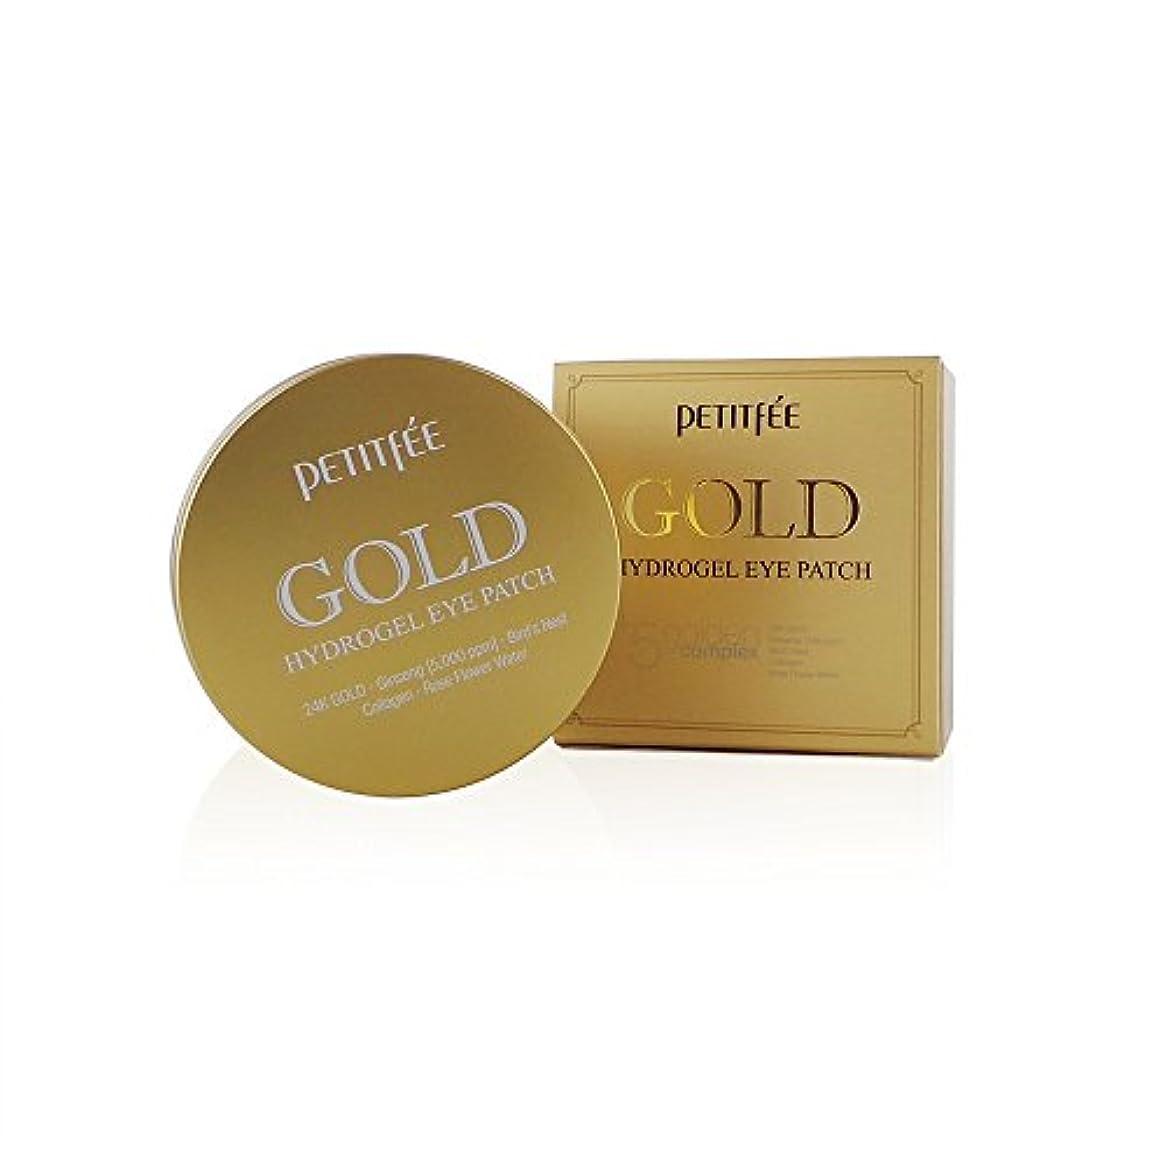 沈黙前投薬偽装する(3 Pack) PETITFEE Gold Hydrogel Eye Patch (並行輸入品)